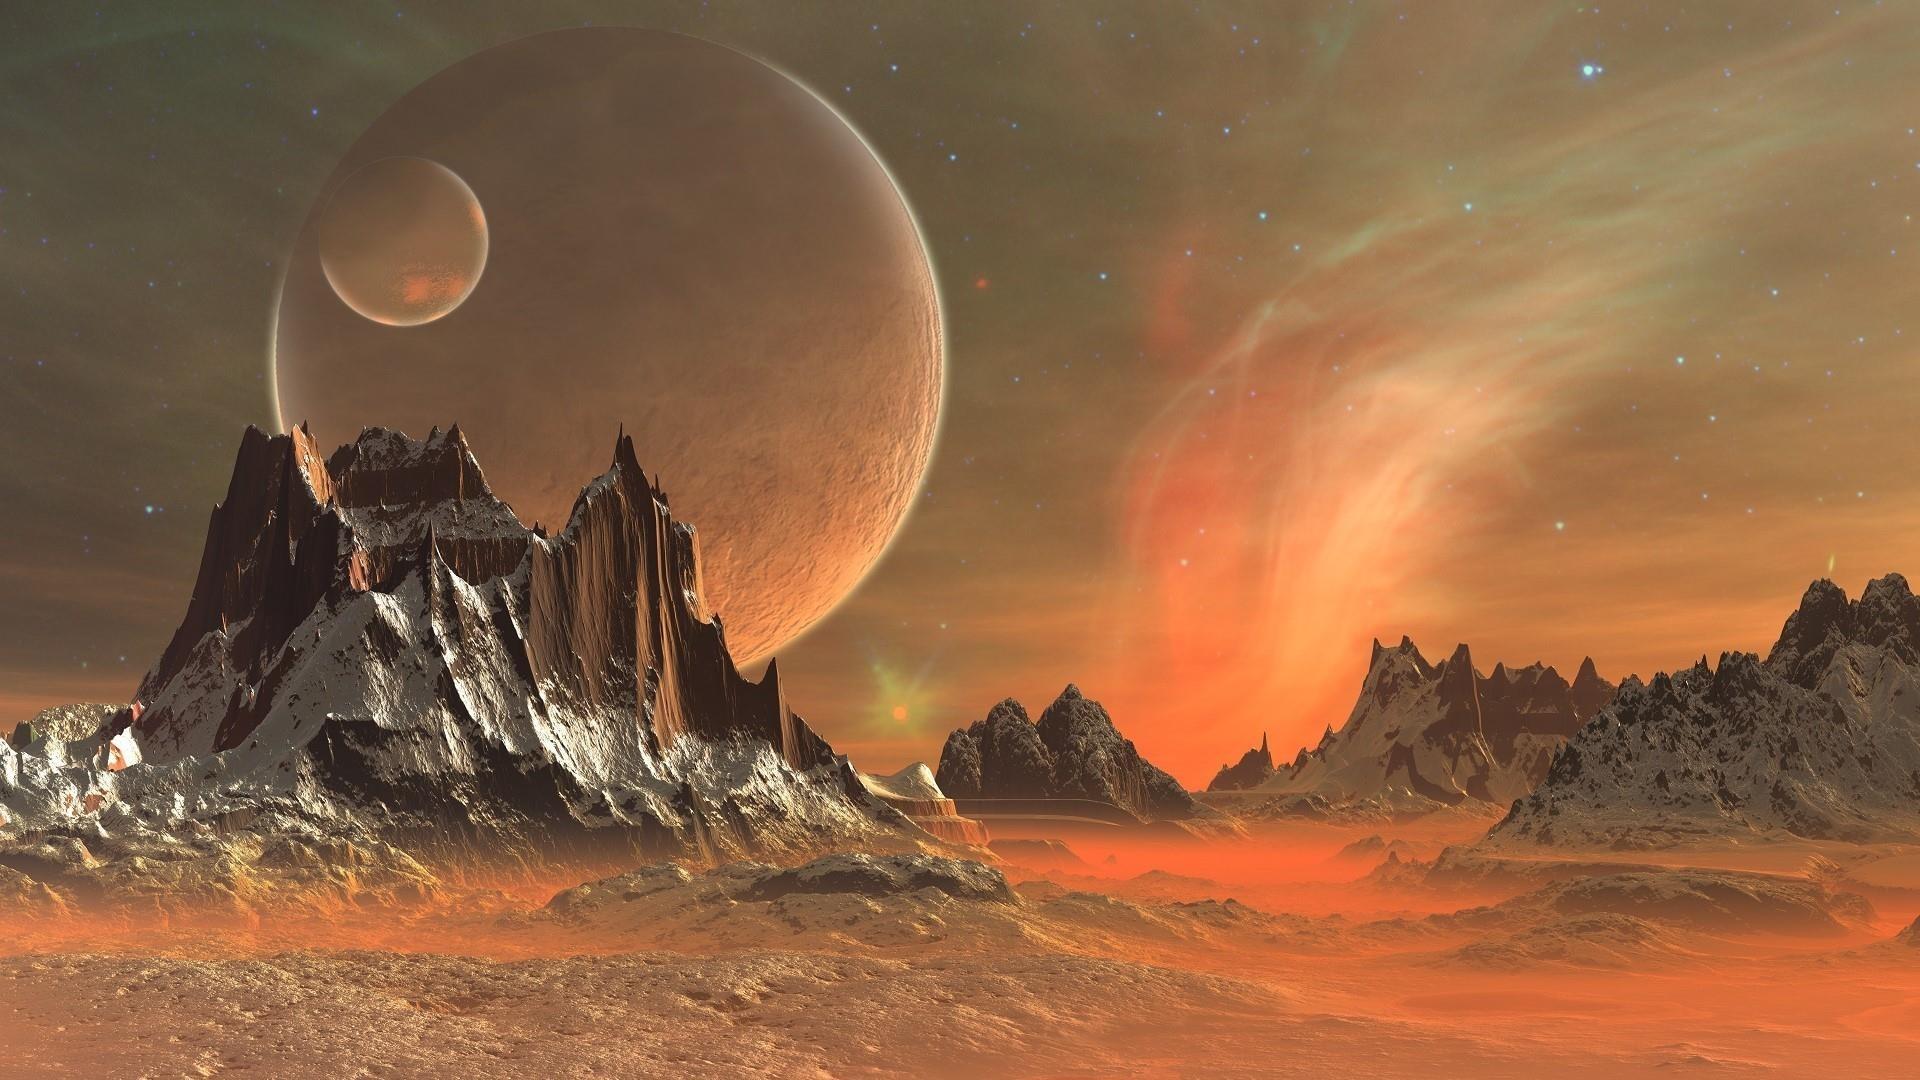 Alien Planet Art wallpaper for computer